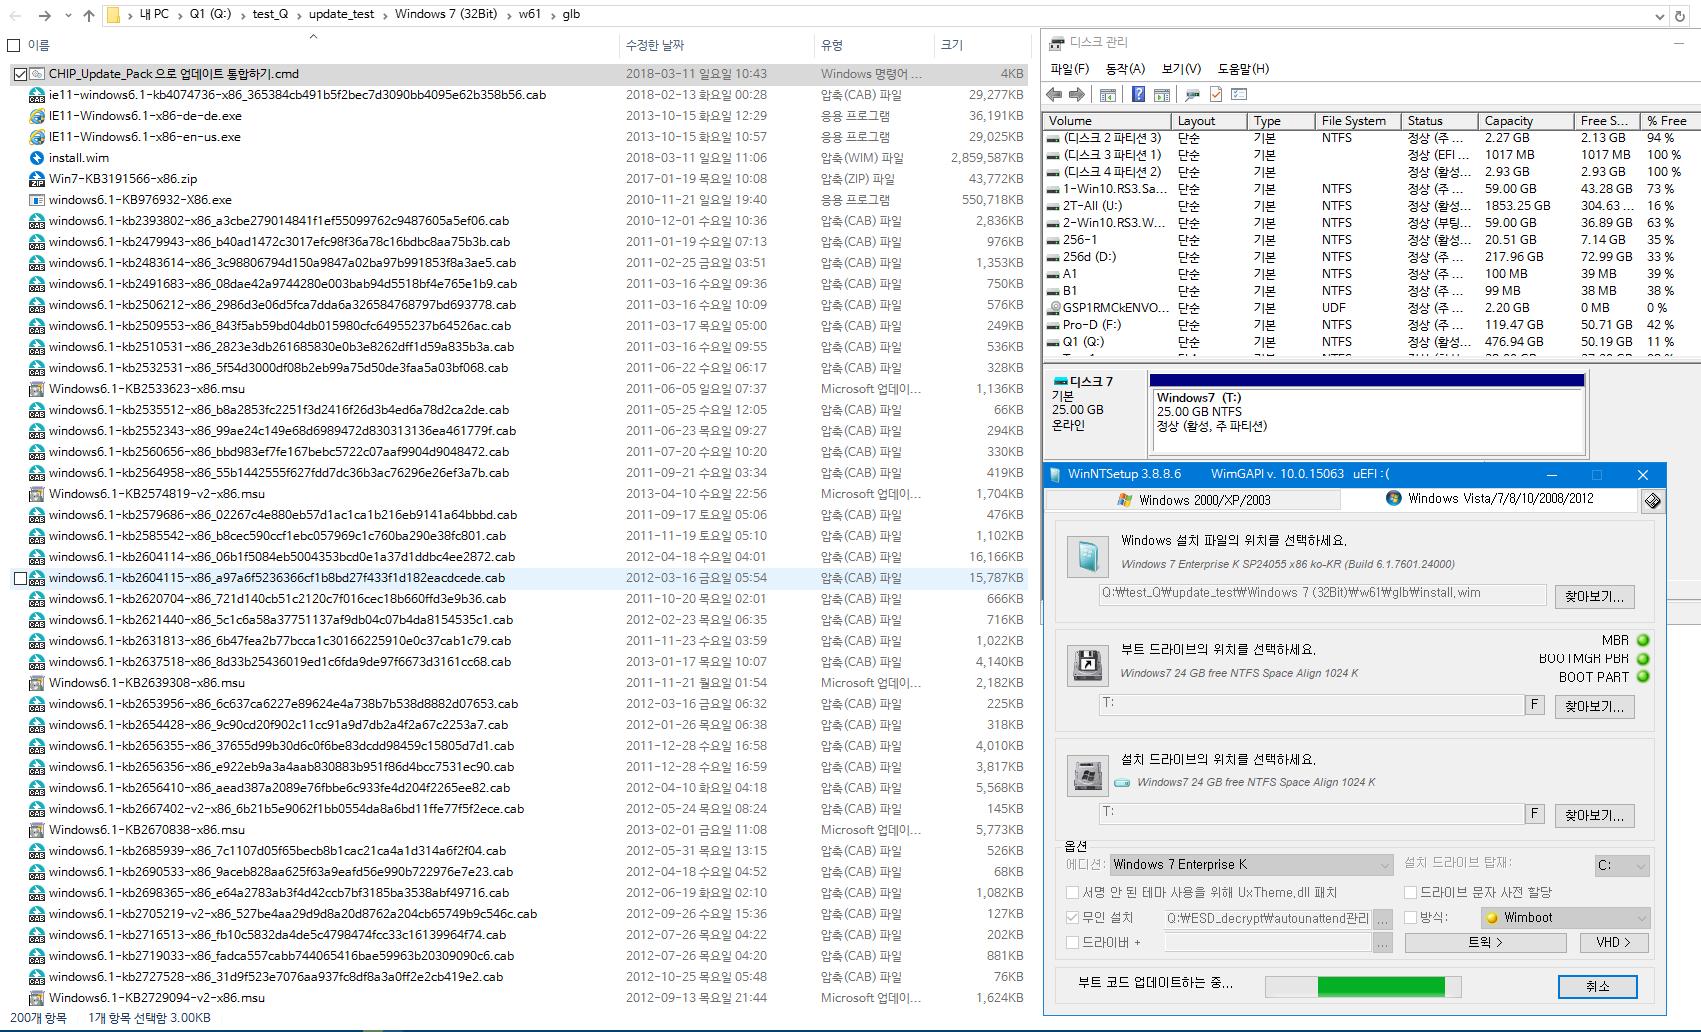 CHIP_Update_Pack_Februar 업데이트팩 통합 테스트 중입니다 - 제가 대략 만든 통합 bat 파일 사용 - 후반부에 줄초상나는 업데이트 파일이 있네요 - KB3177467 이네요 - bat 파일 수정하여 다시 통합중 - 성공적이네요 - 설치 테스트 2018-03-11_112002.png